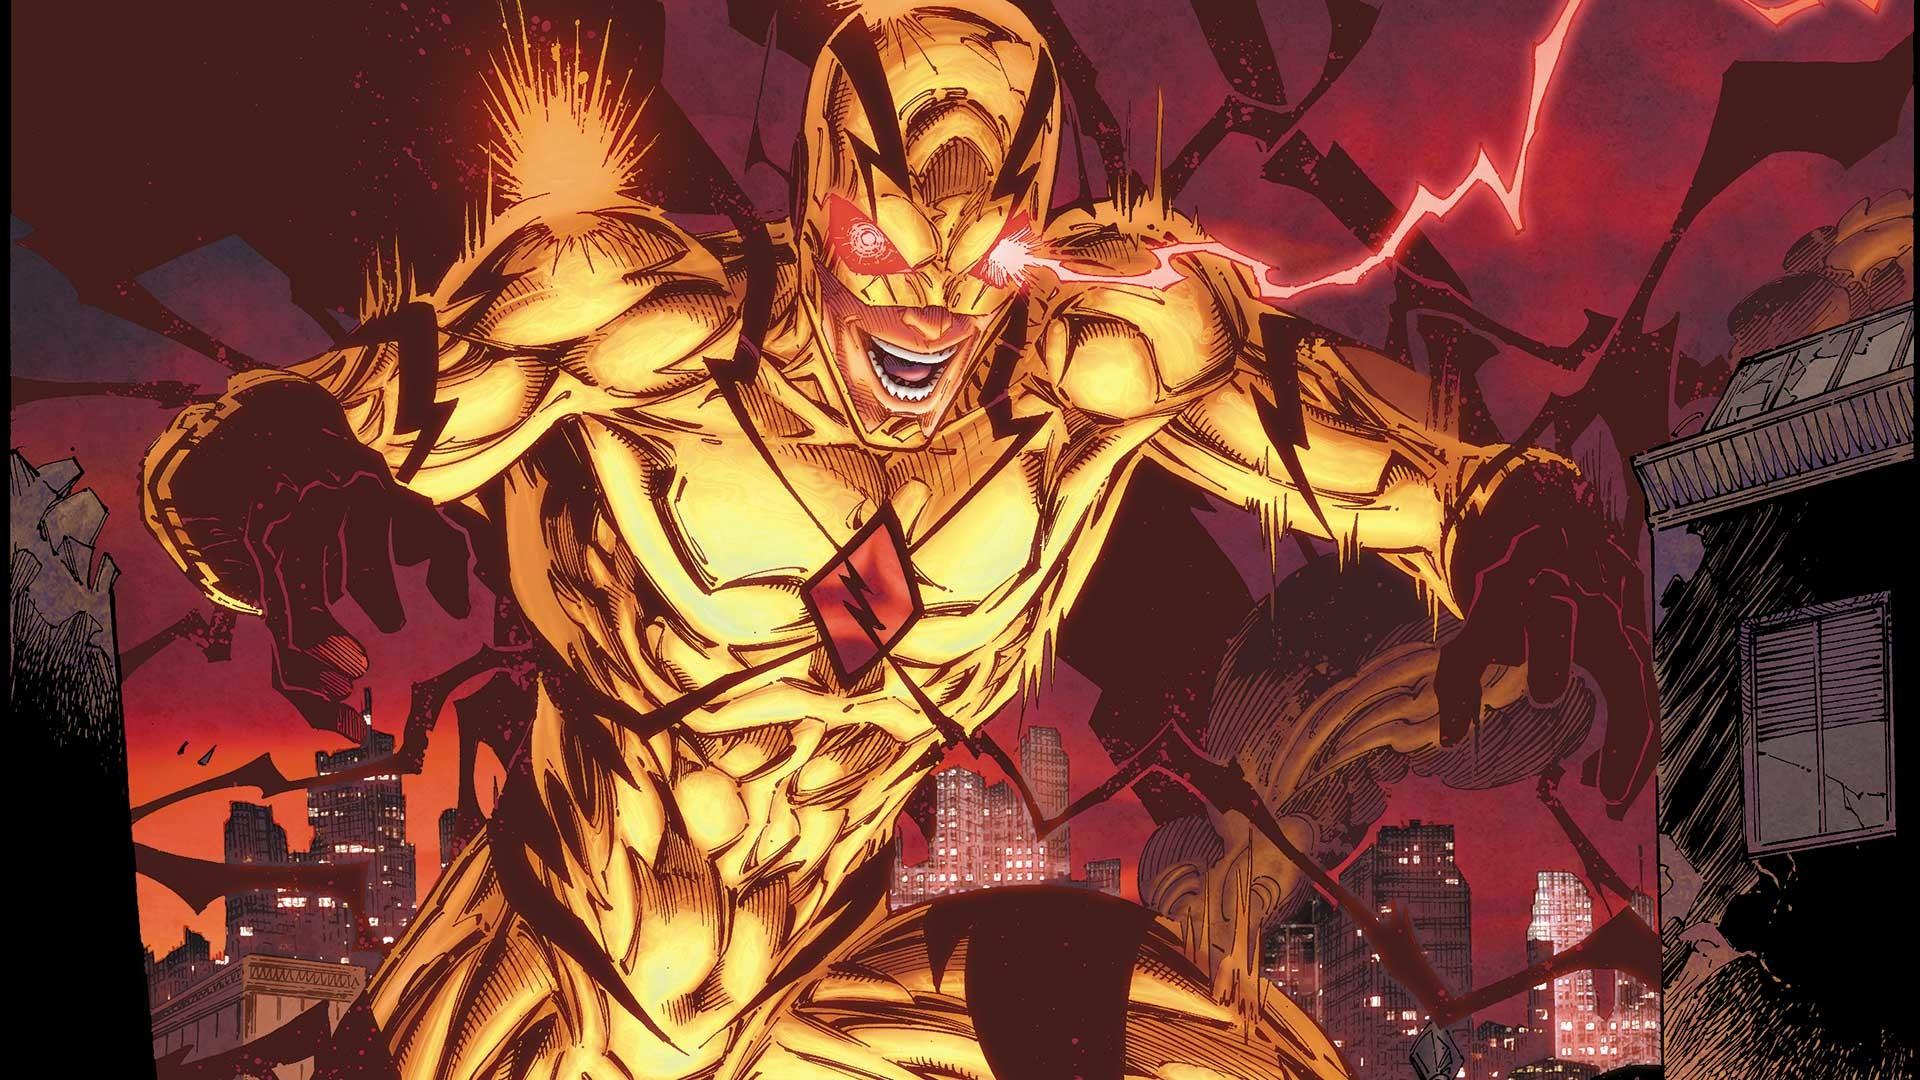 2560x1440 Dc Comics Superhero Hero Warrior D C Harley Quinn Download 1920x1080 Nightwing New 52 Wallpaper